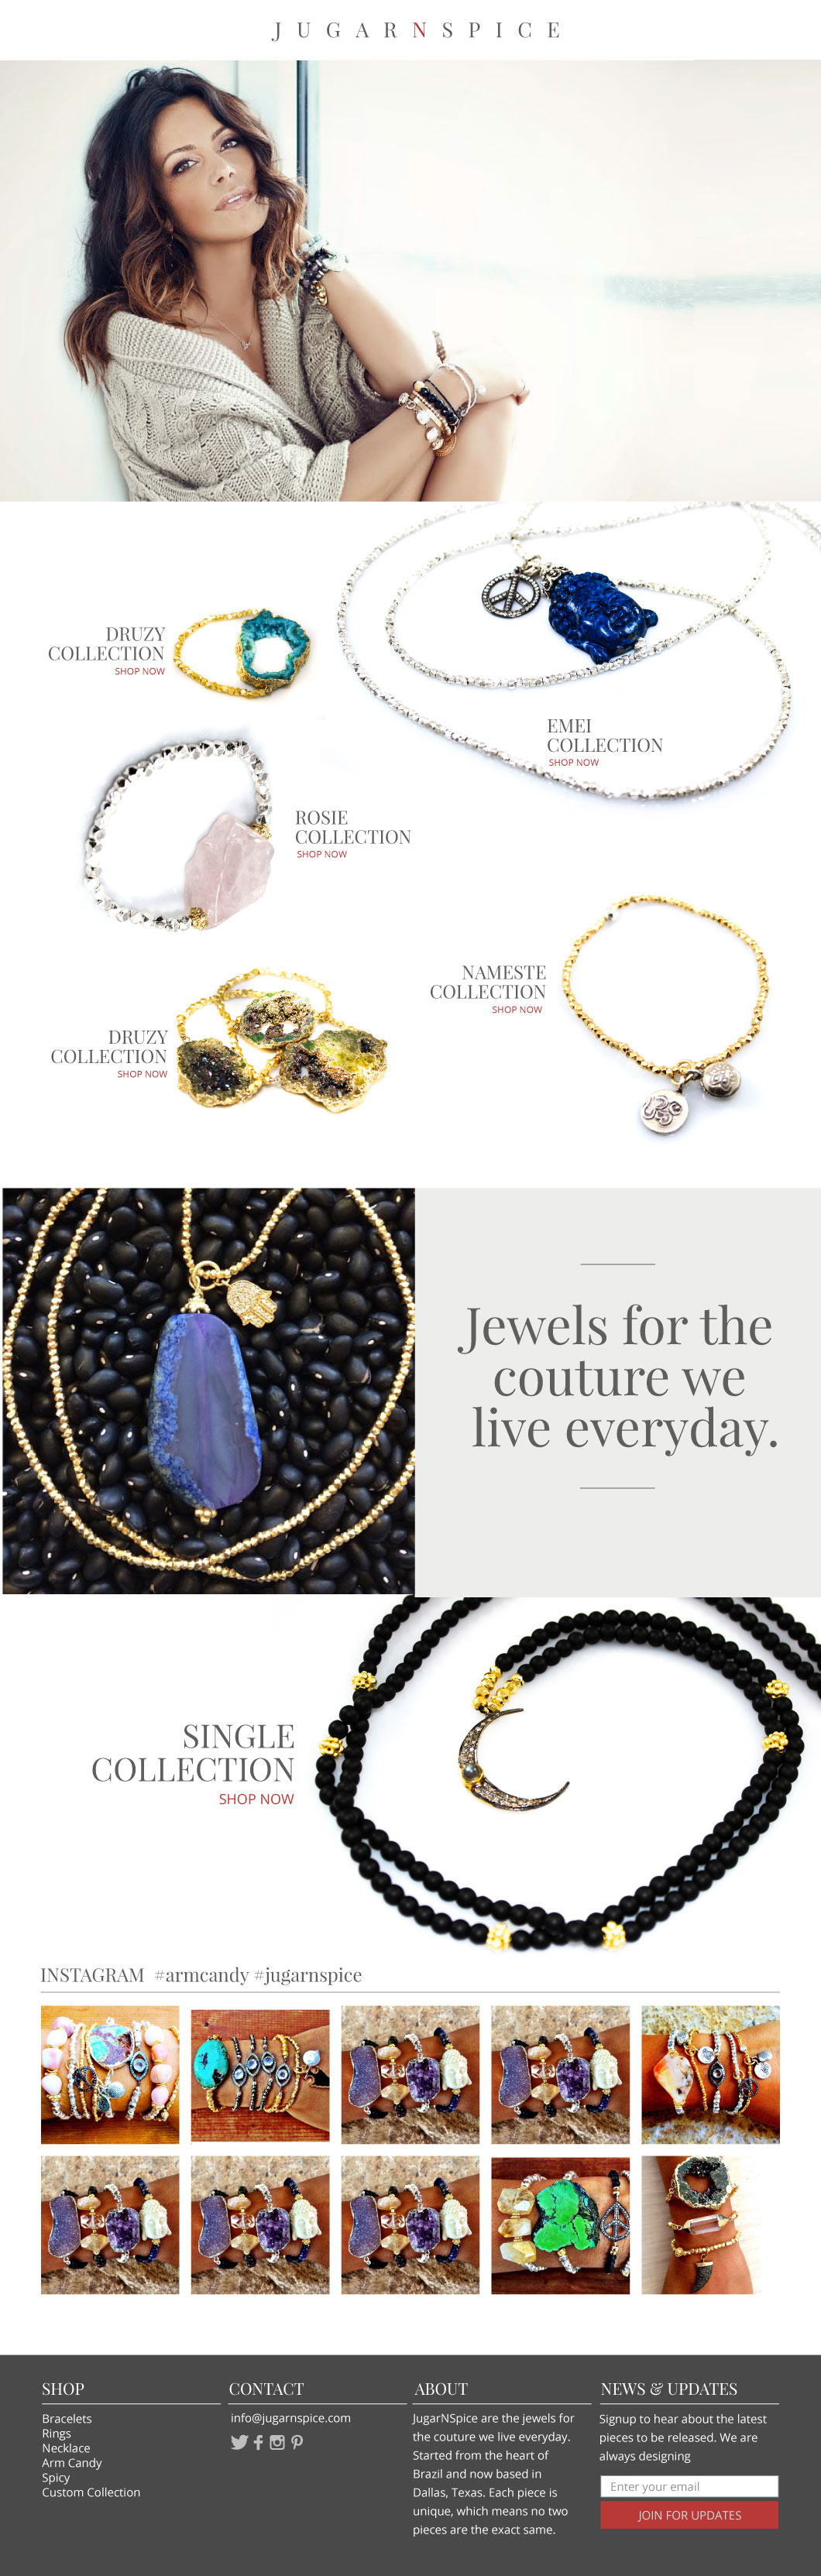 Brand and Website Design/Development for JugarNSpice Jewelry : Robyn Larsen